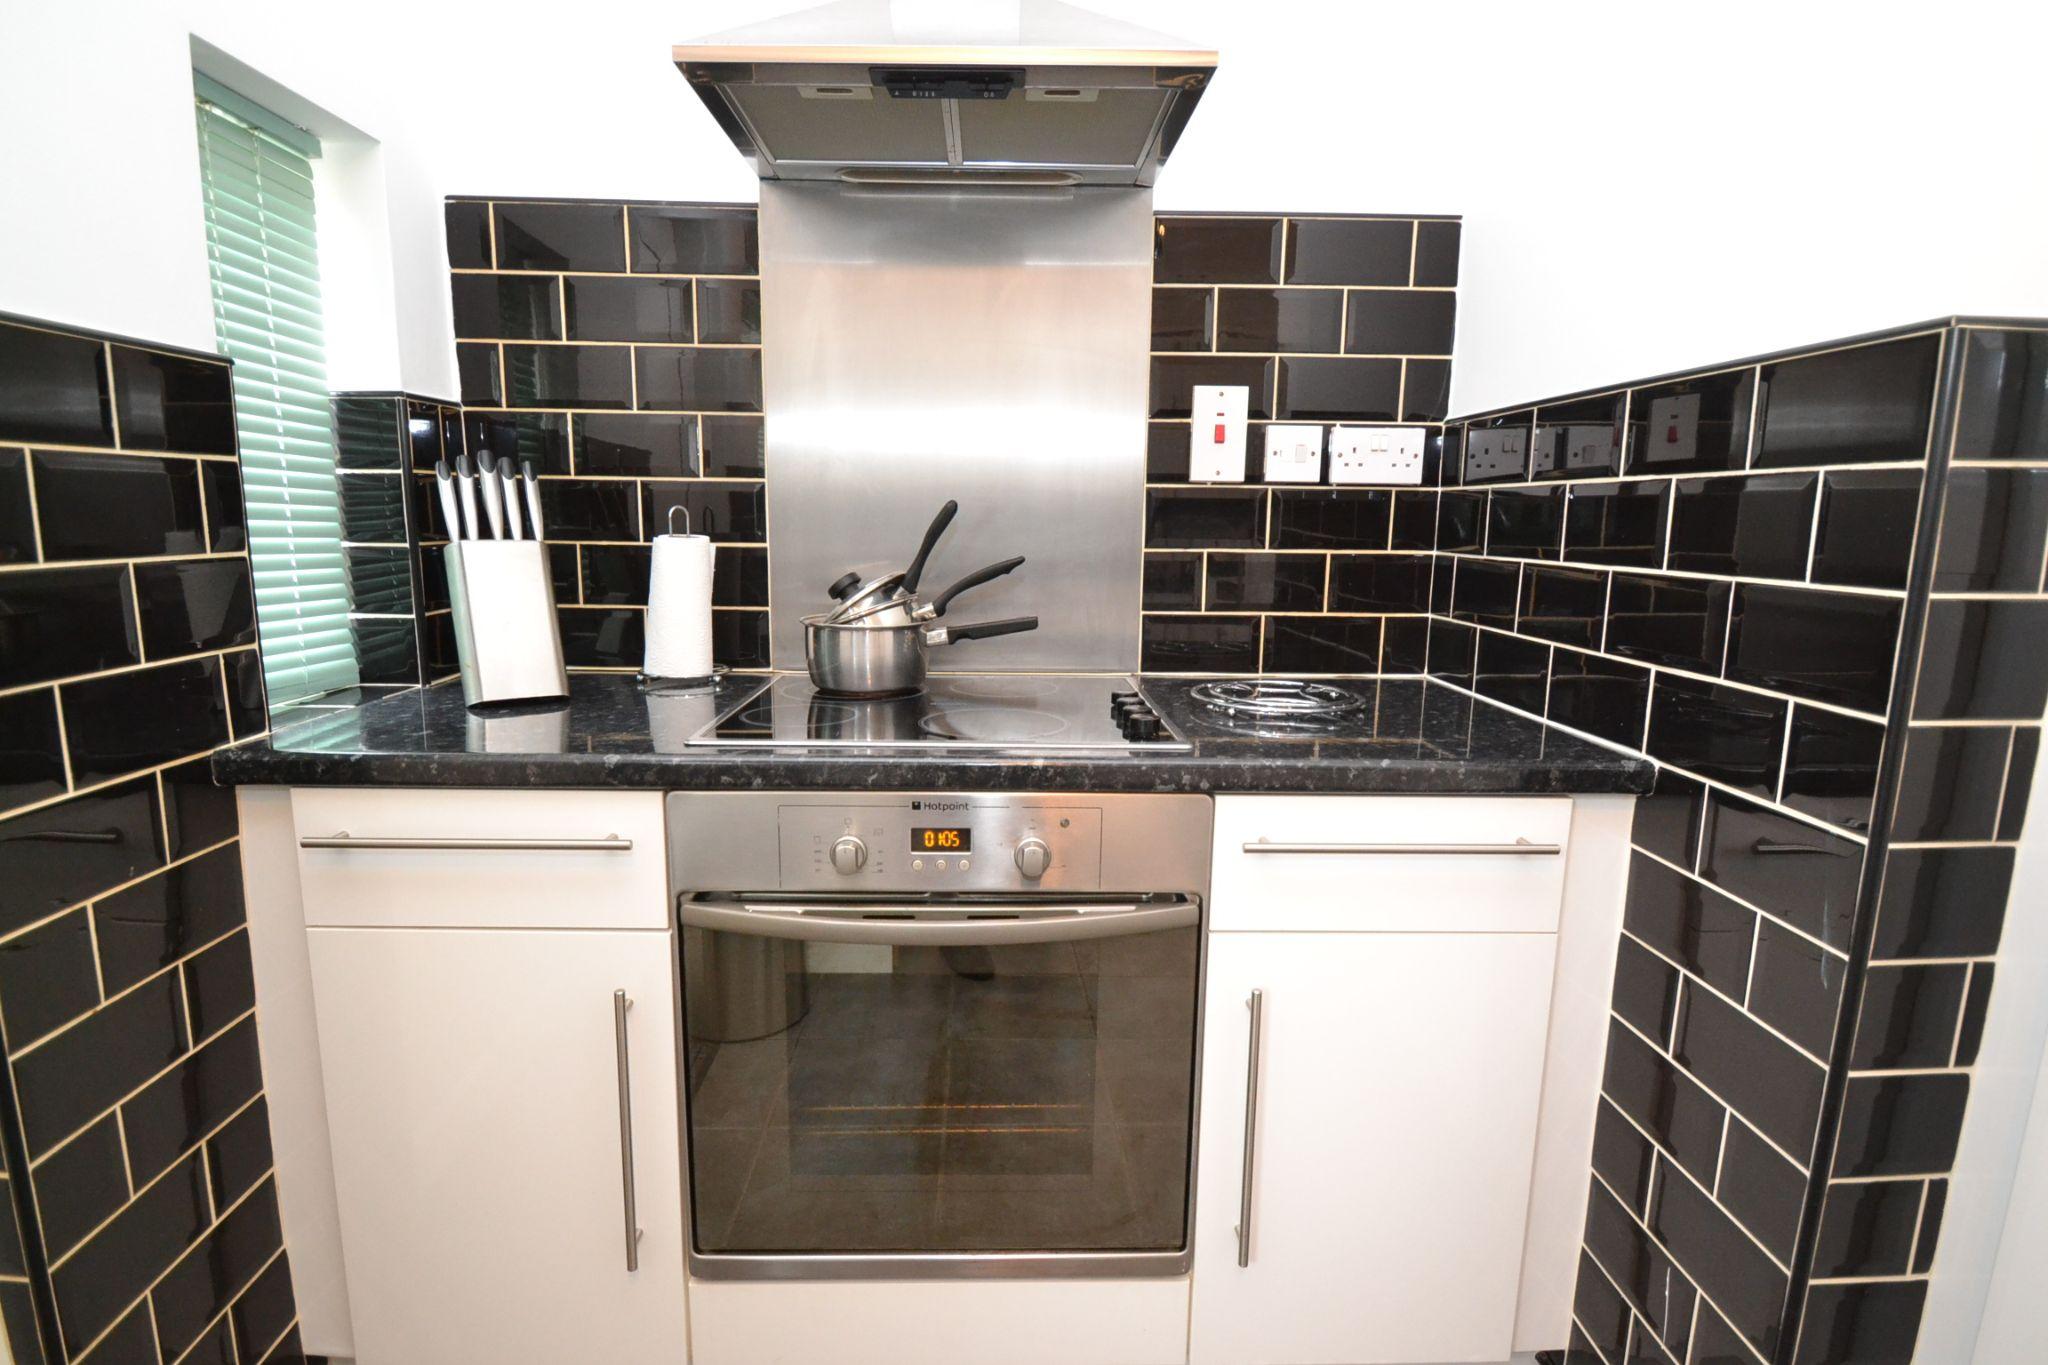 1 Bedroom Ground Floor Maisonette Flat/apartment For Sale - Photograph 5